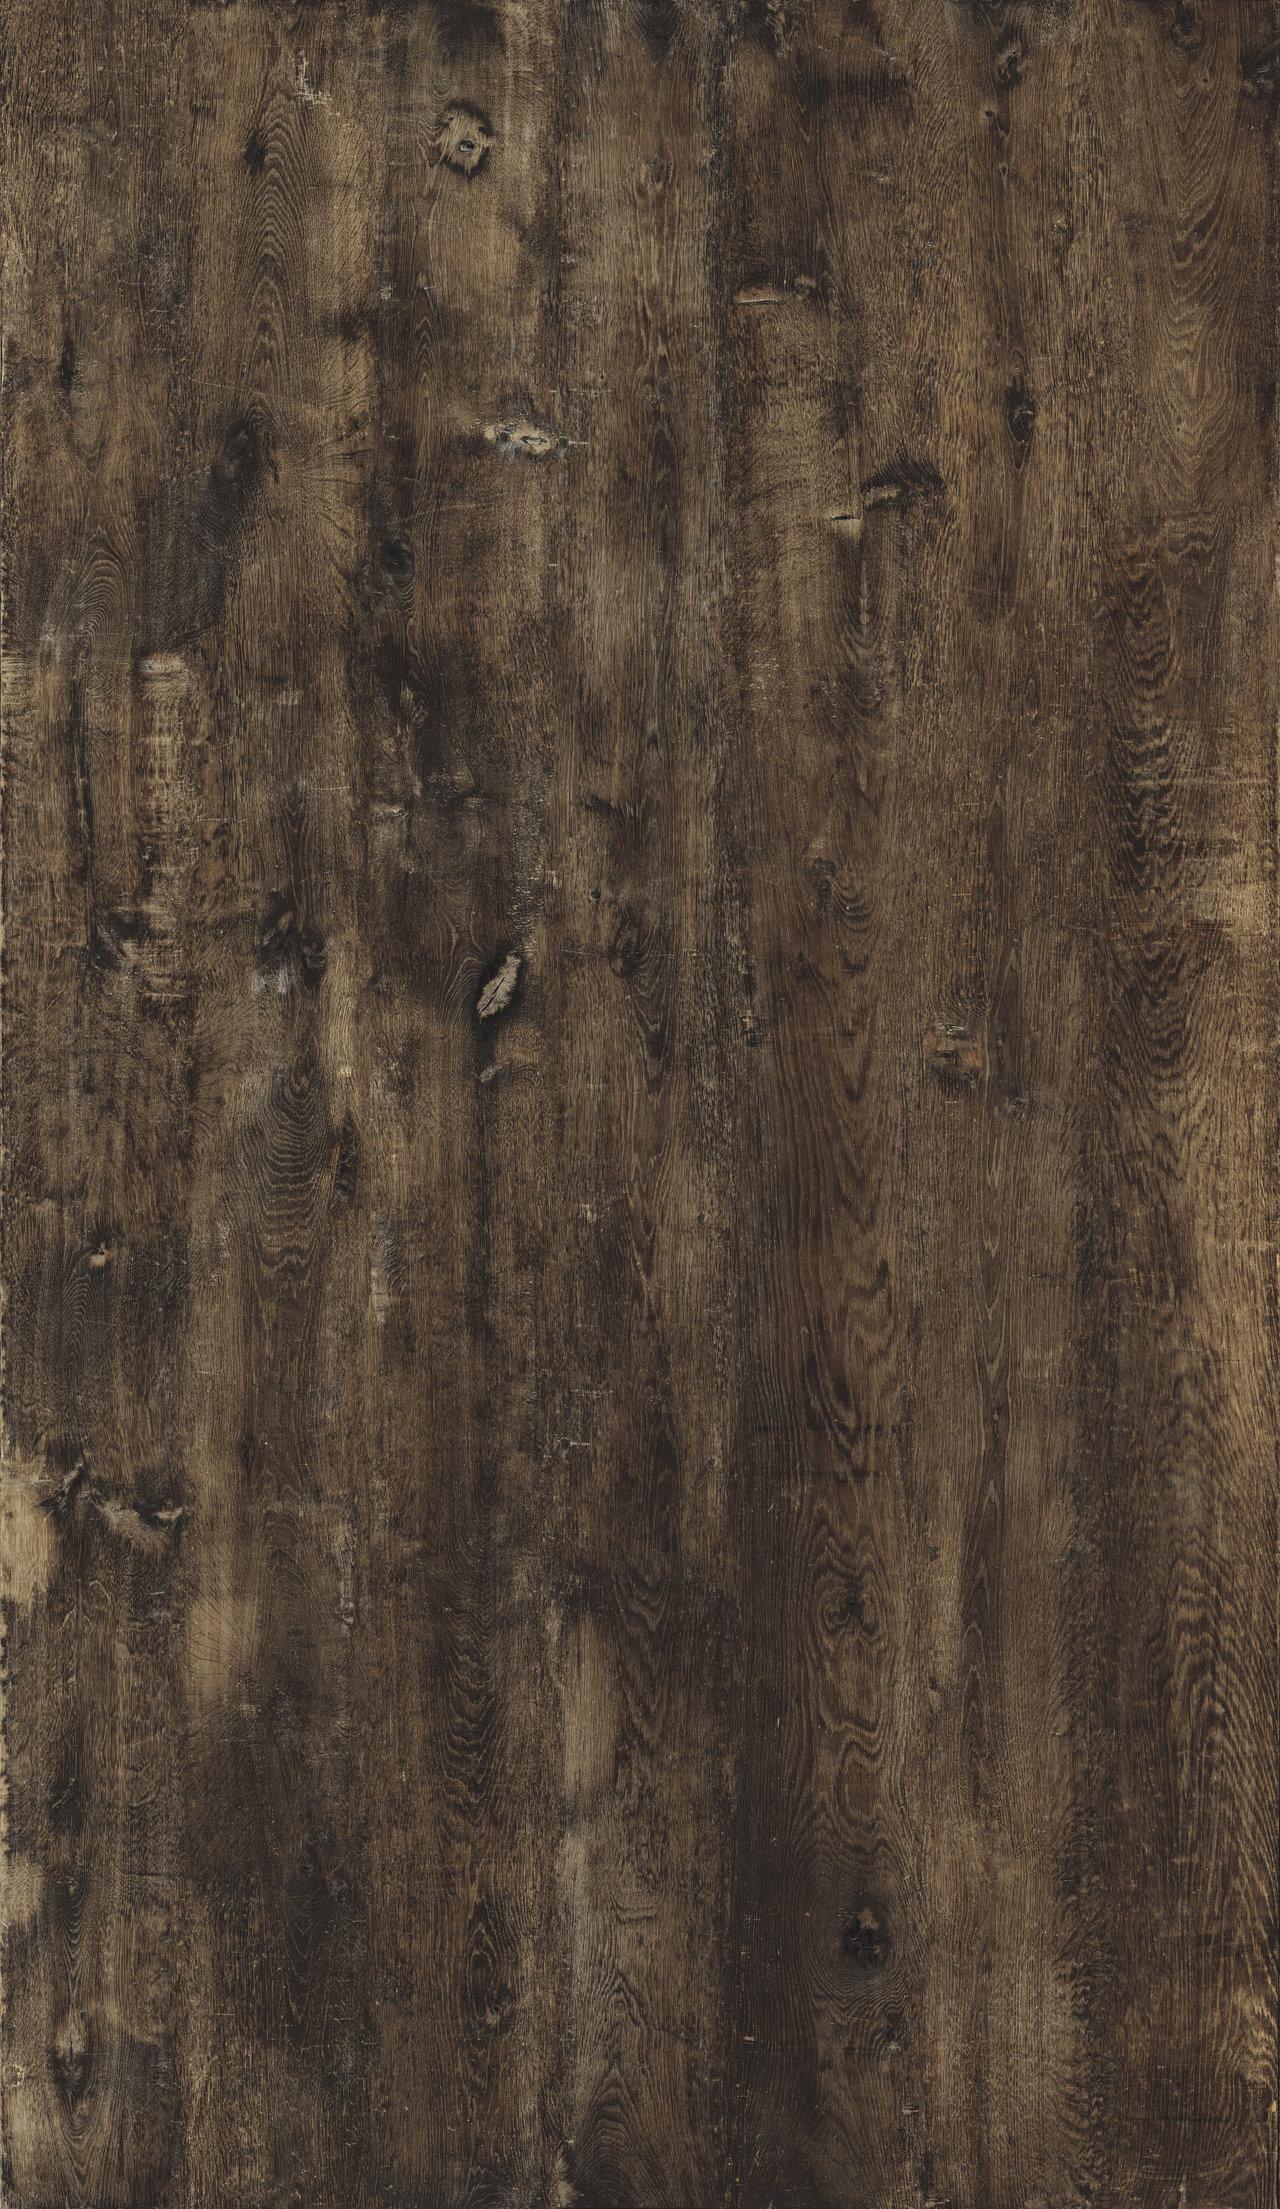 Lochwood sp lw cedar nat 1248 f1 USG1248214